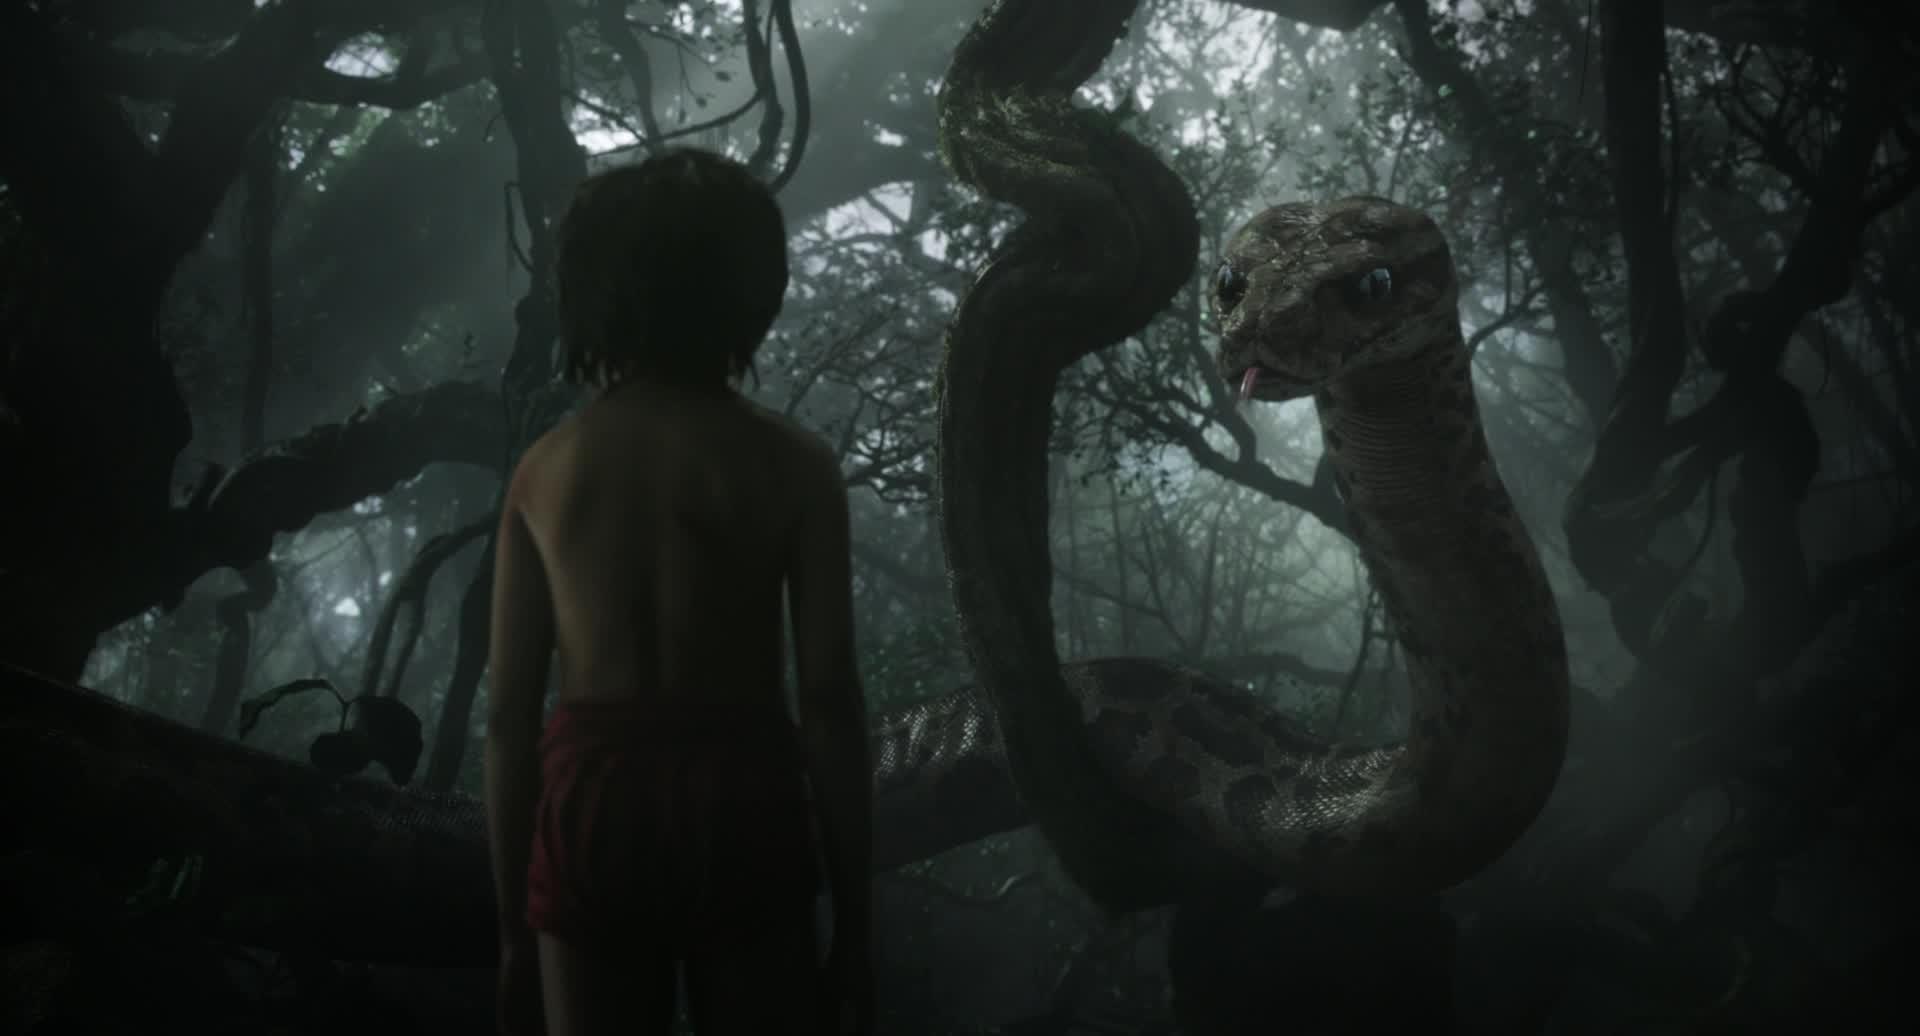 The jungle book poster trailer